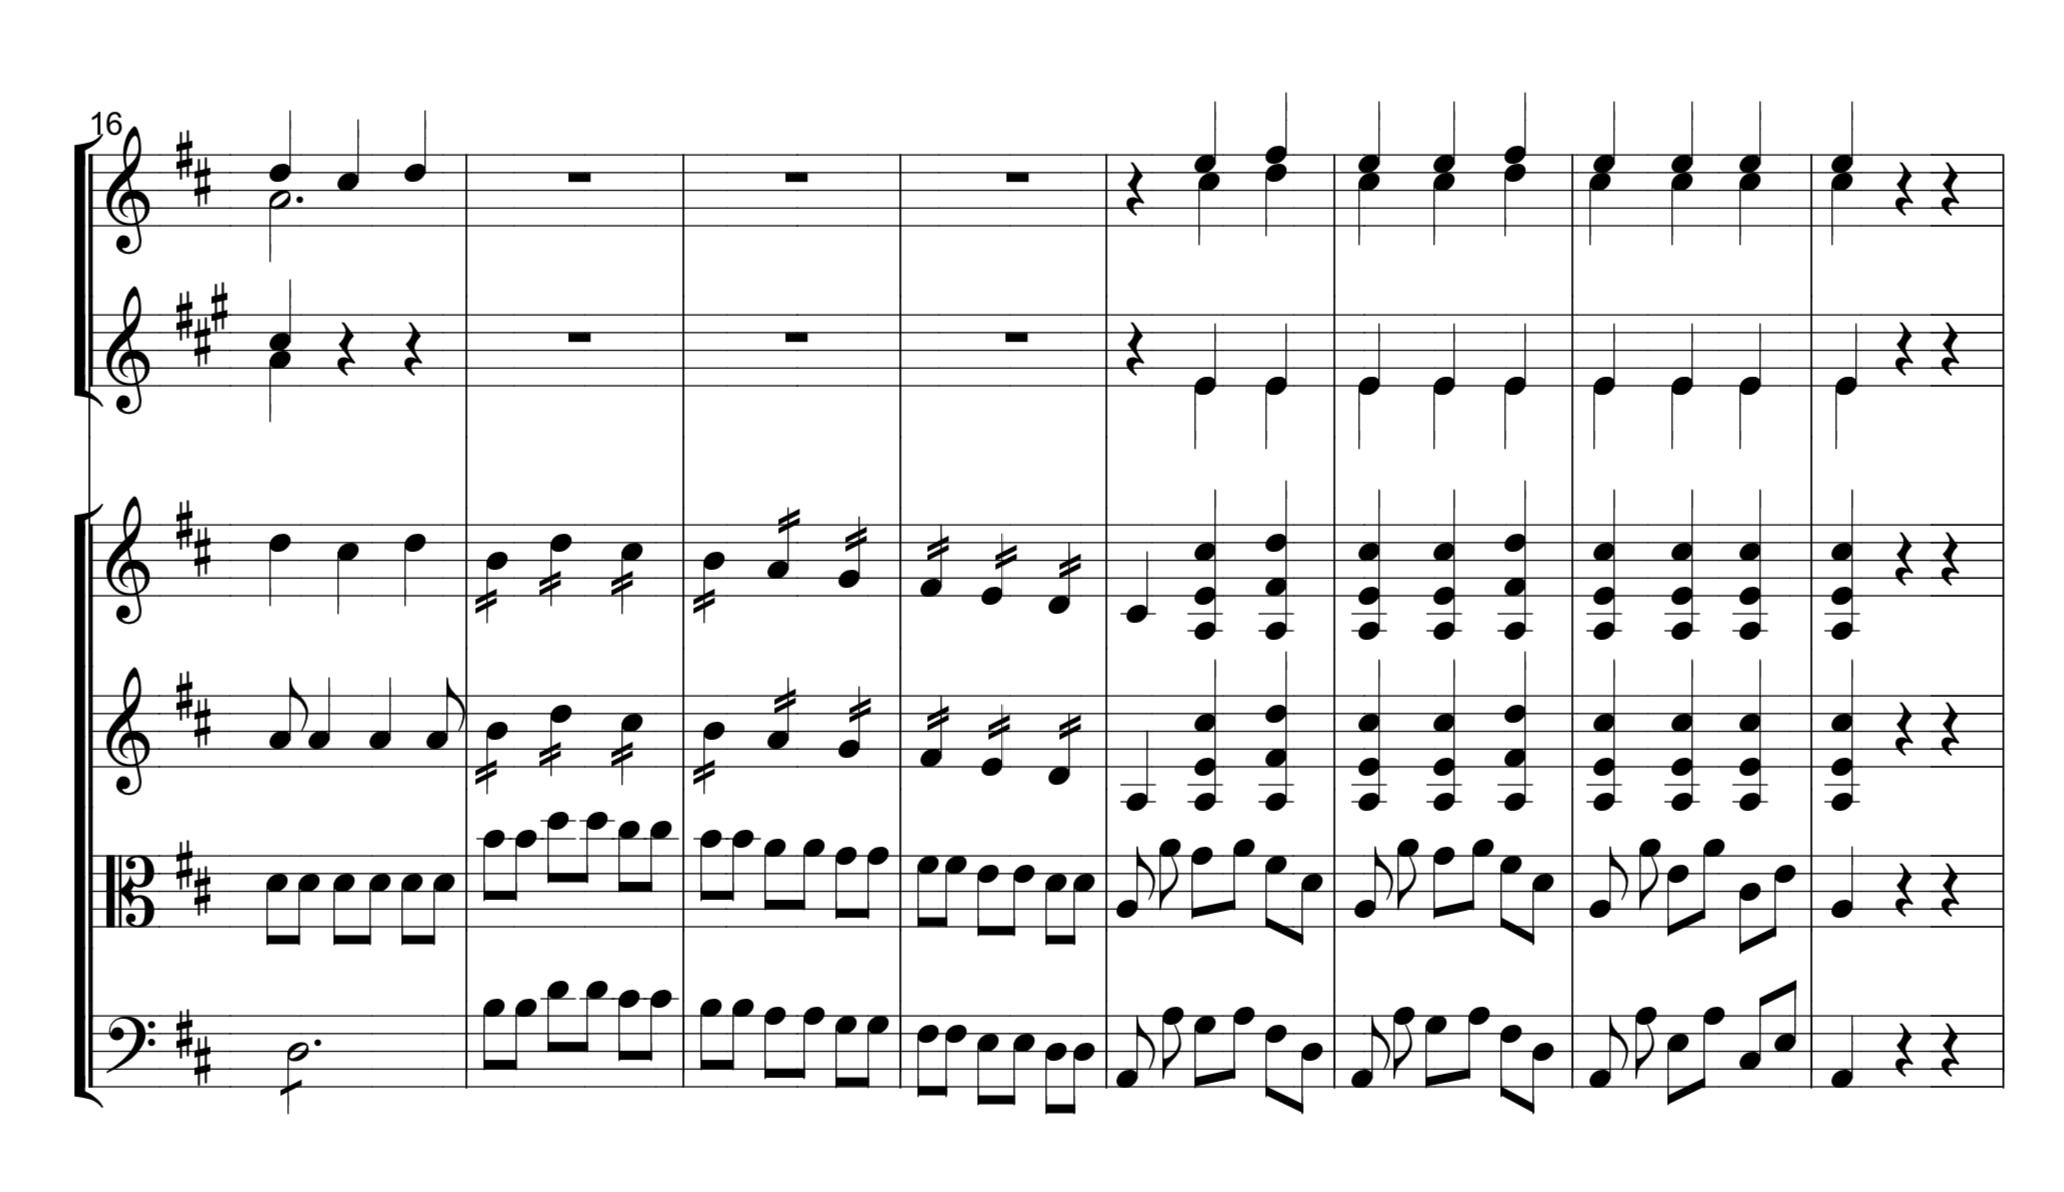 Example 2: MC in measure 23